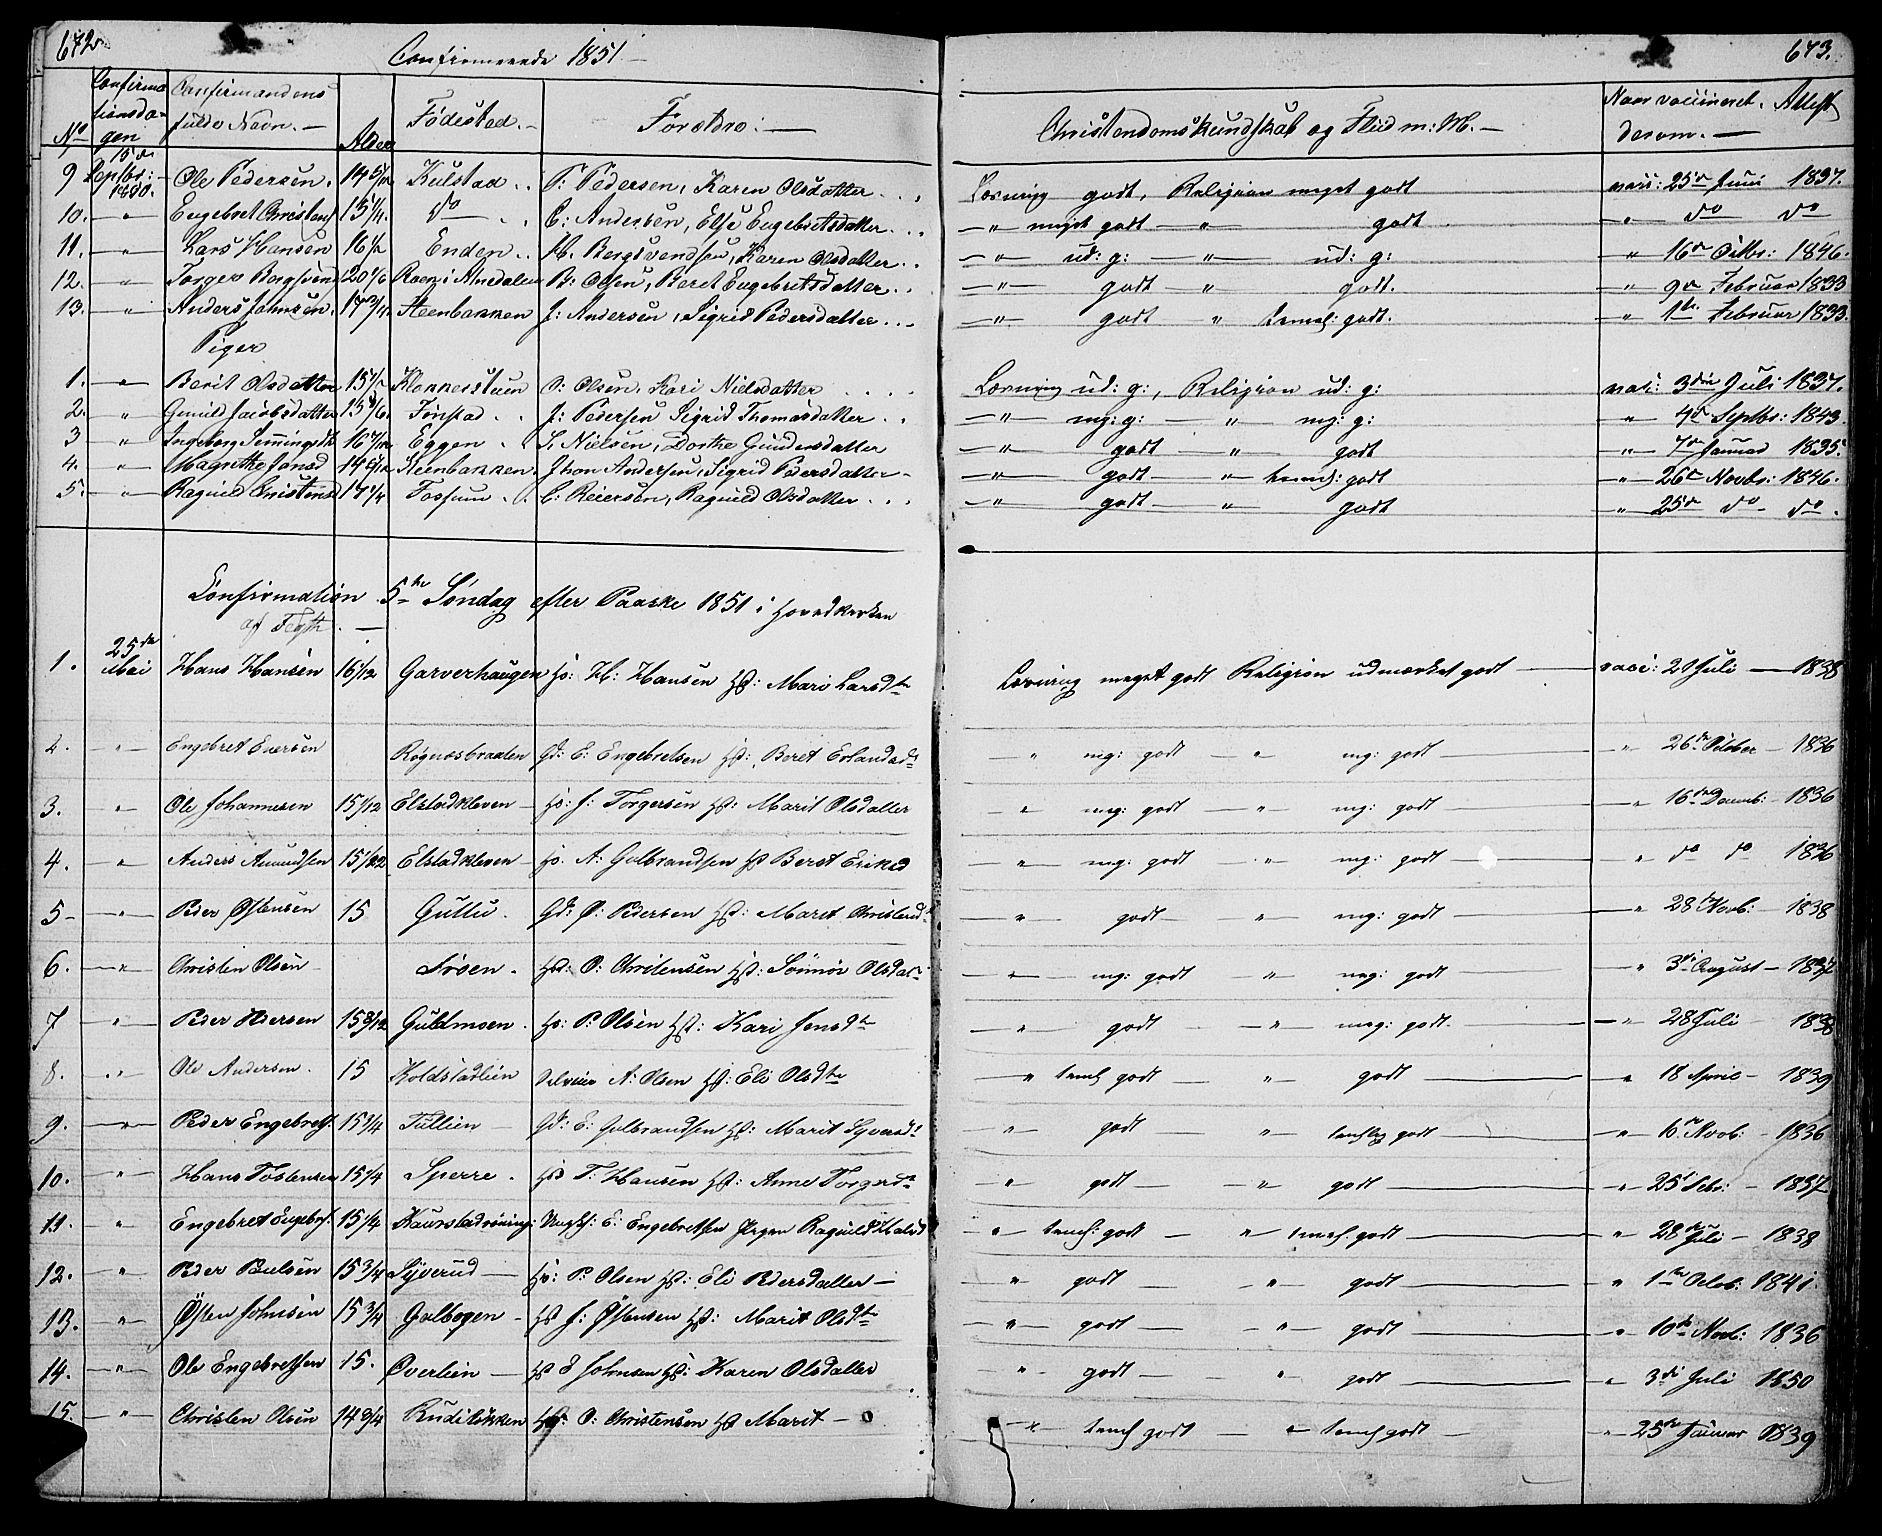 SAH, Ringebu prestekontor, Klokkerbok nr. 2, 1839-1853, s. 672-673